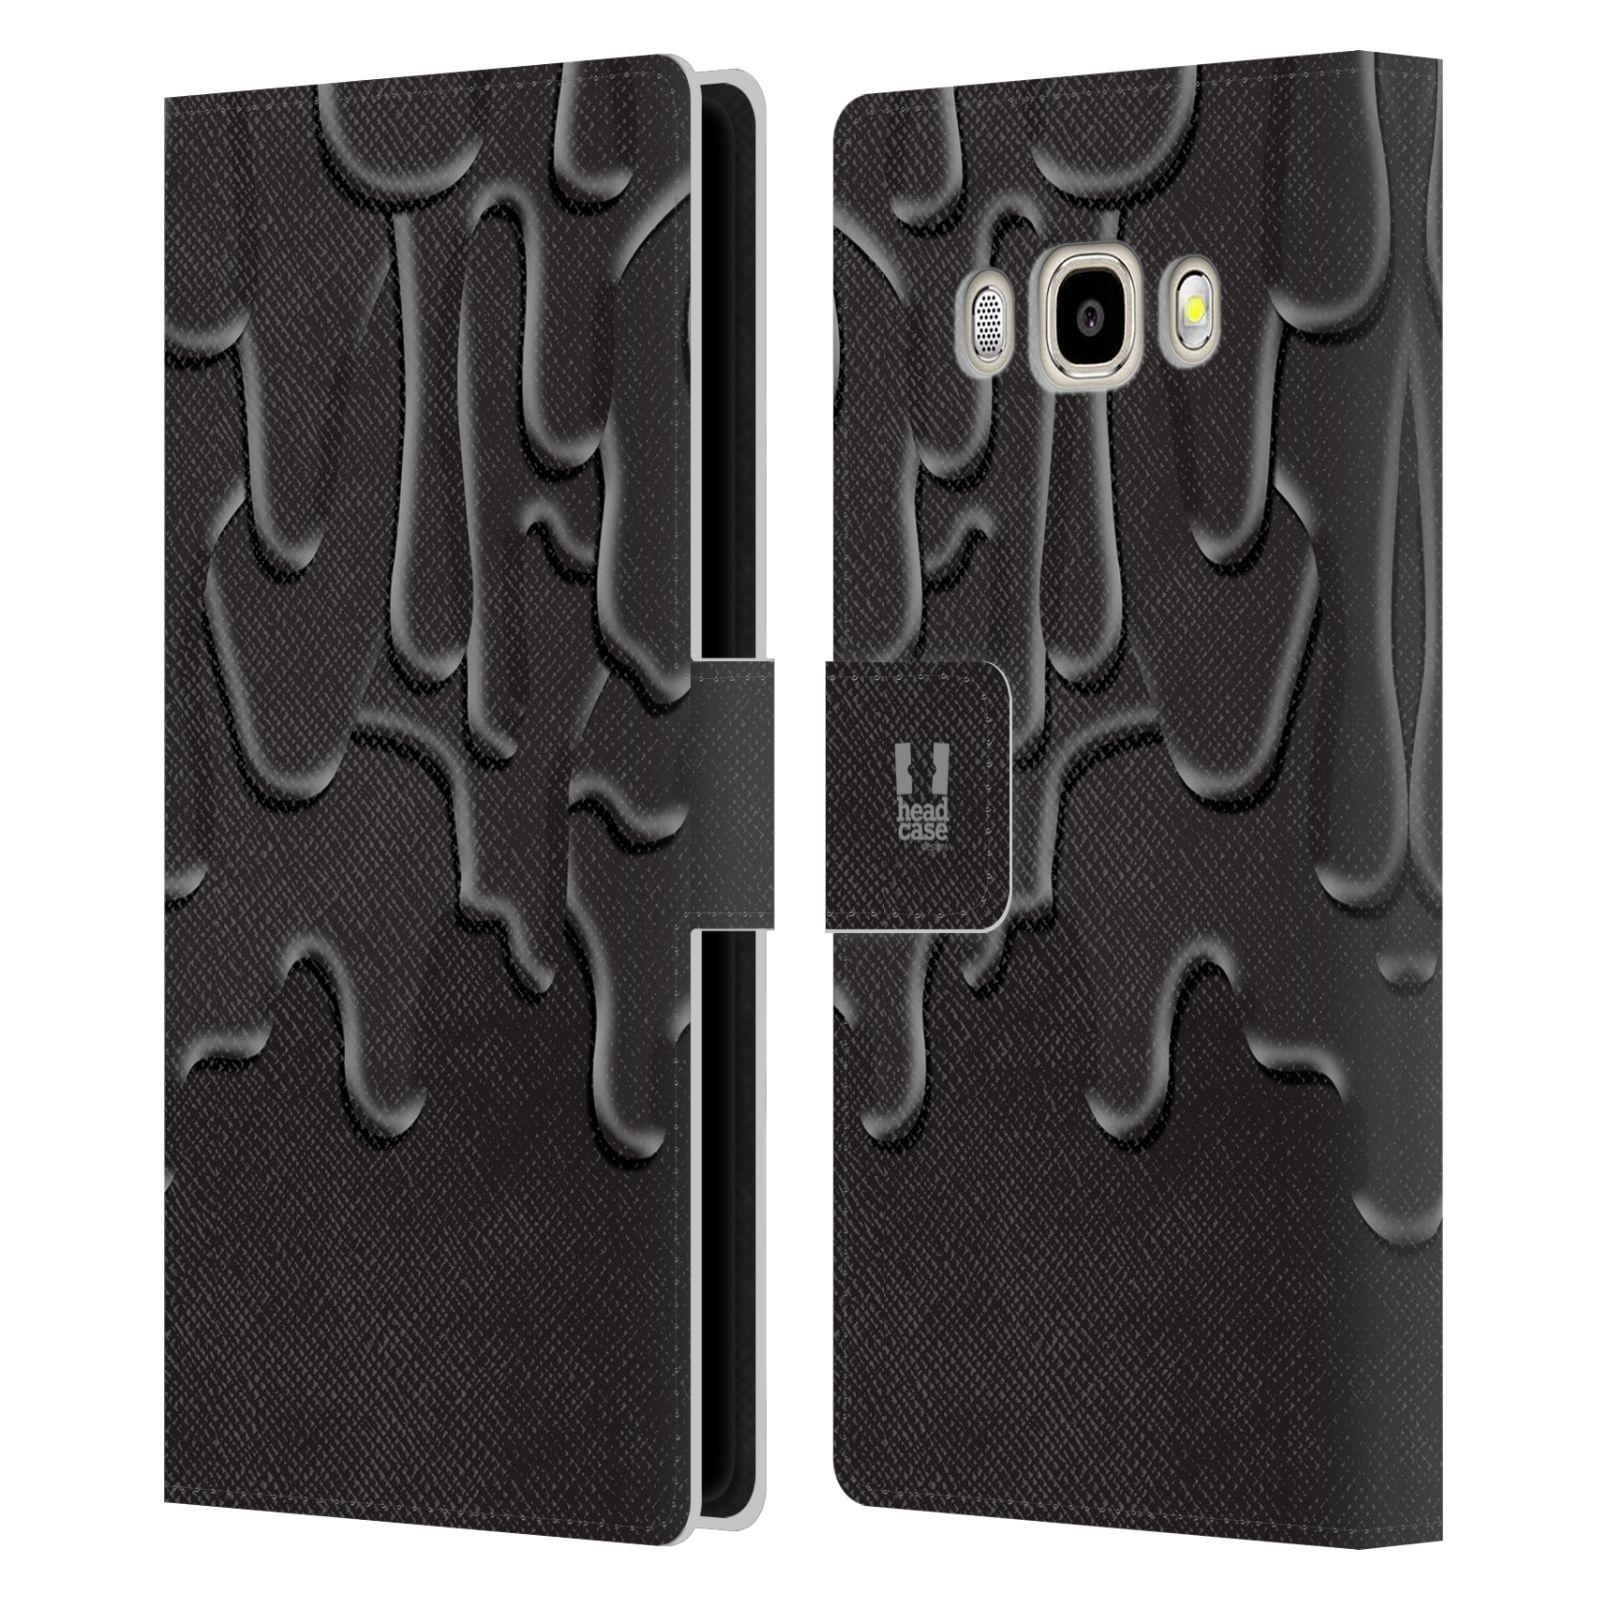 HEAD CASE Flipové pouzdro pro mobil Samsung Galaxy J5 2016 ZÁPLAVA BARVA černá